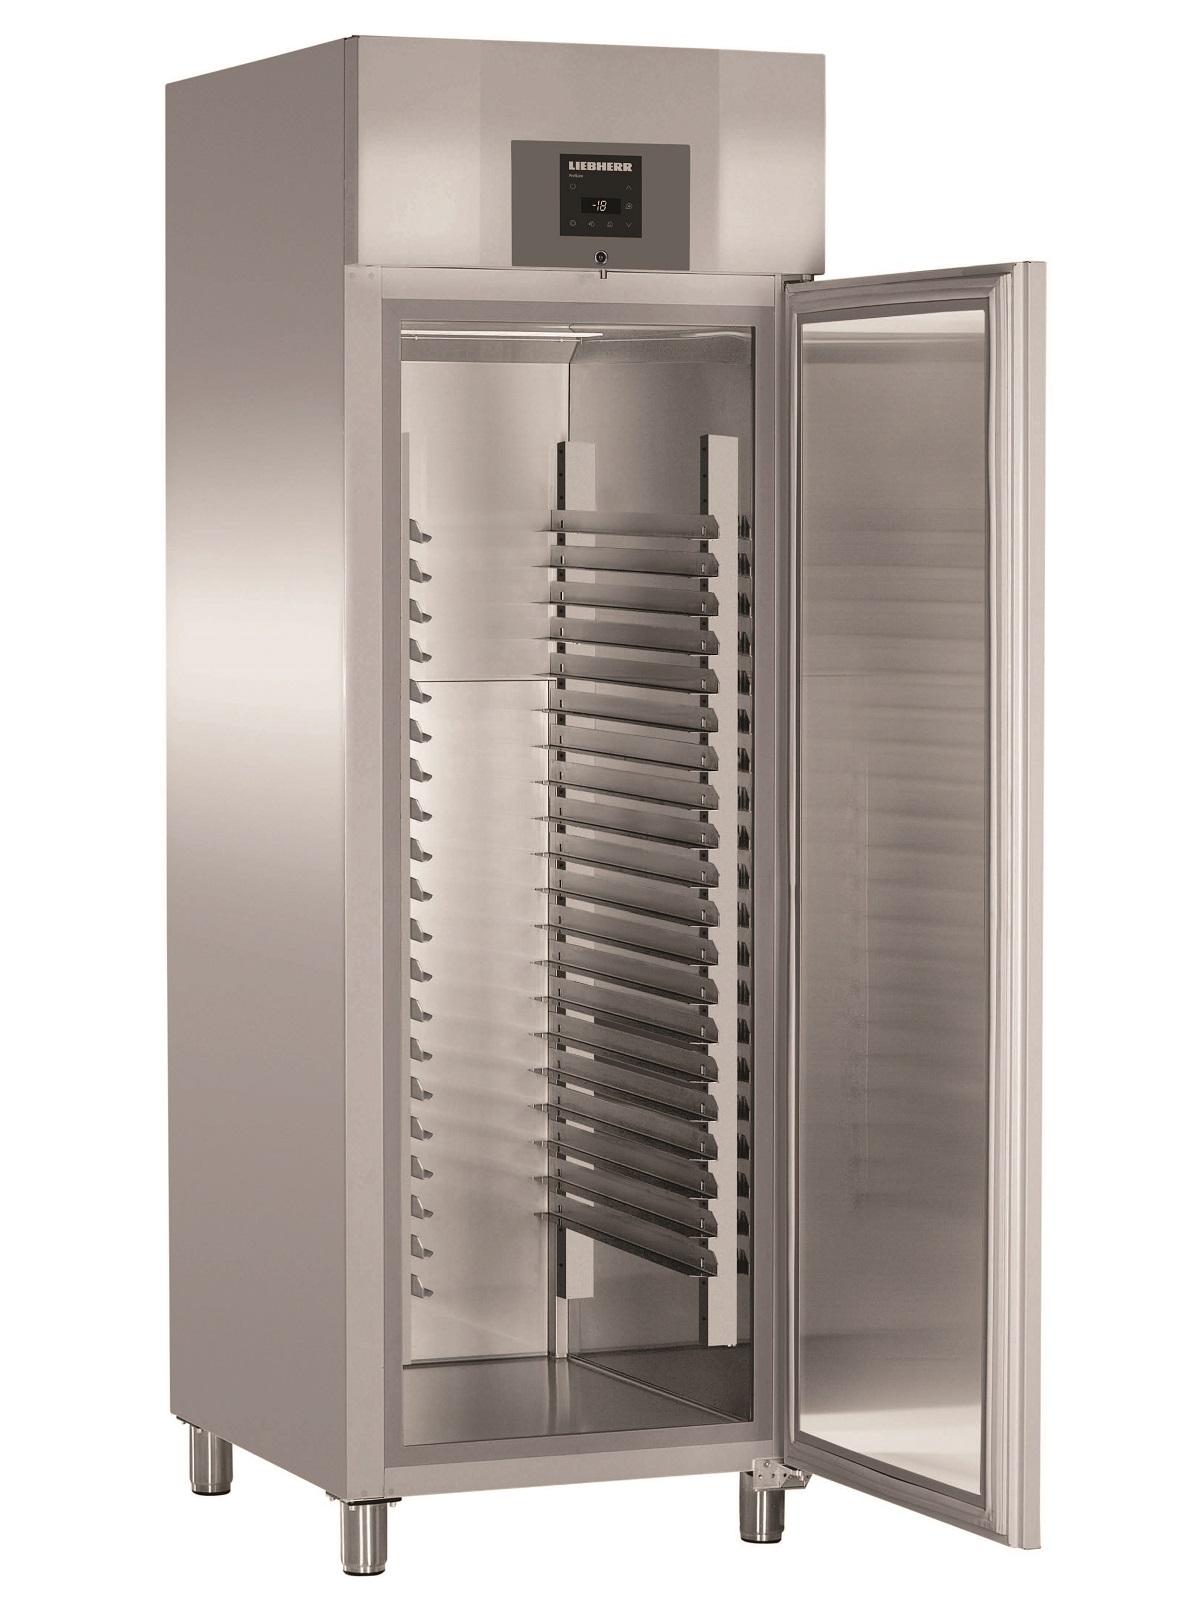 Морозильный шкаф Liebherr BGPv 6570 купить украина